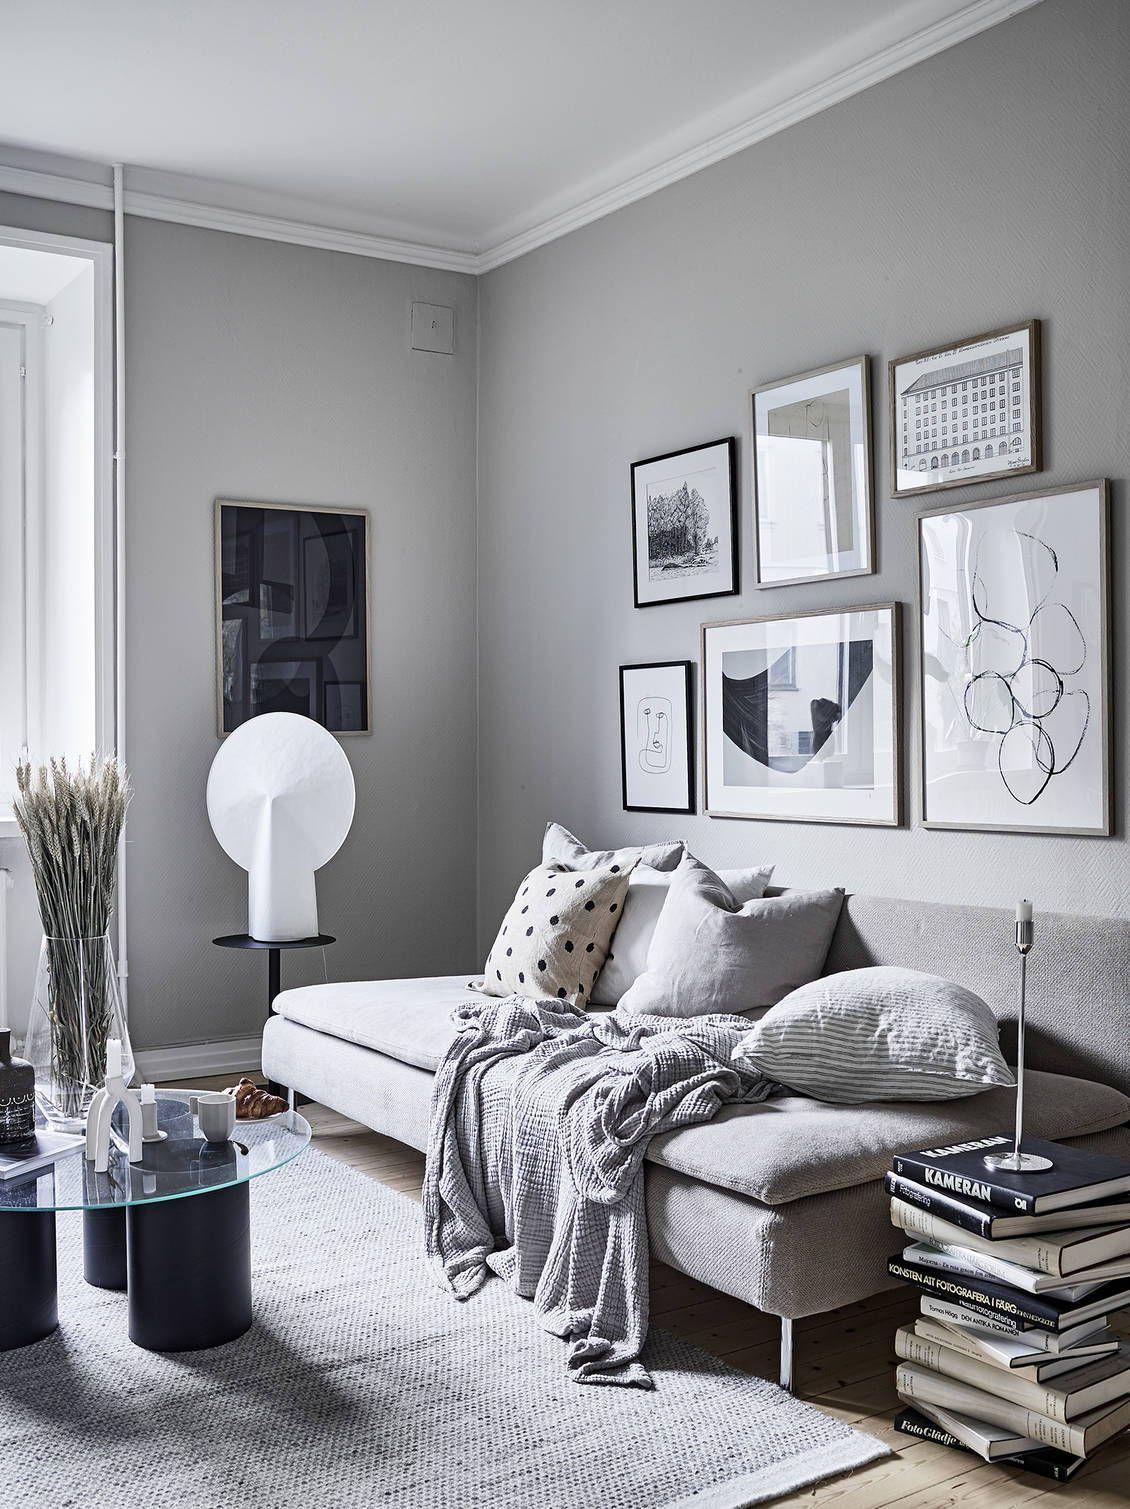 Cozy One Room Apartment One Room Apartment Contemporary